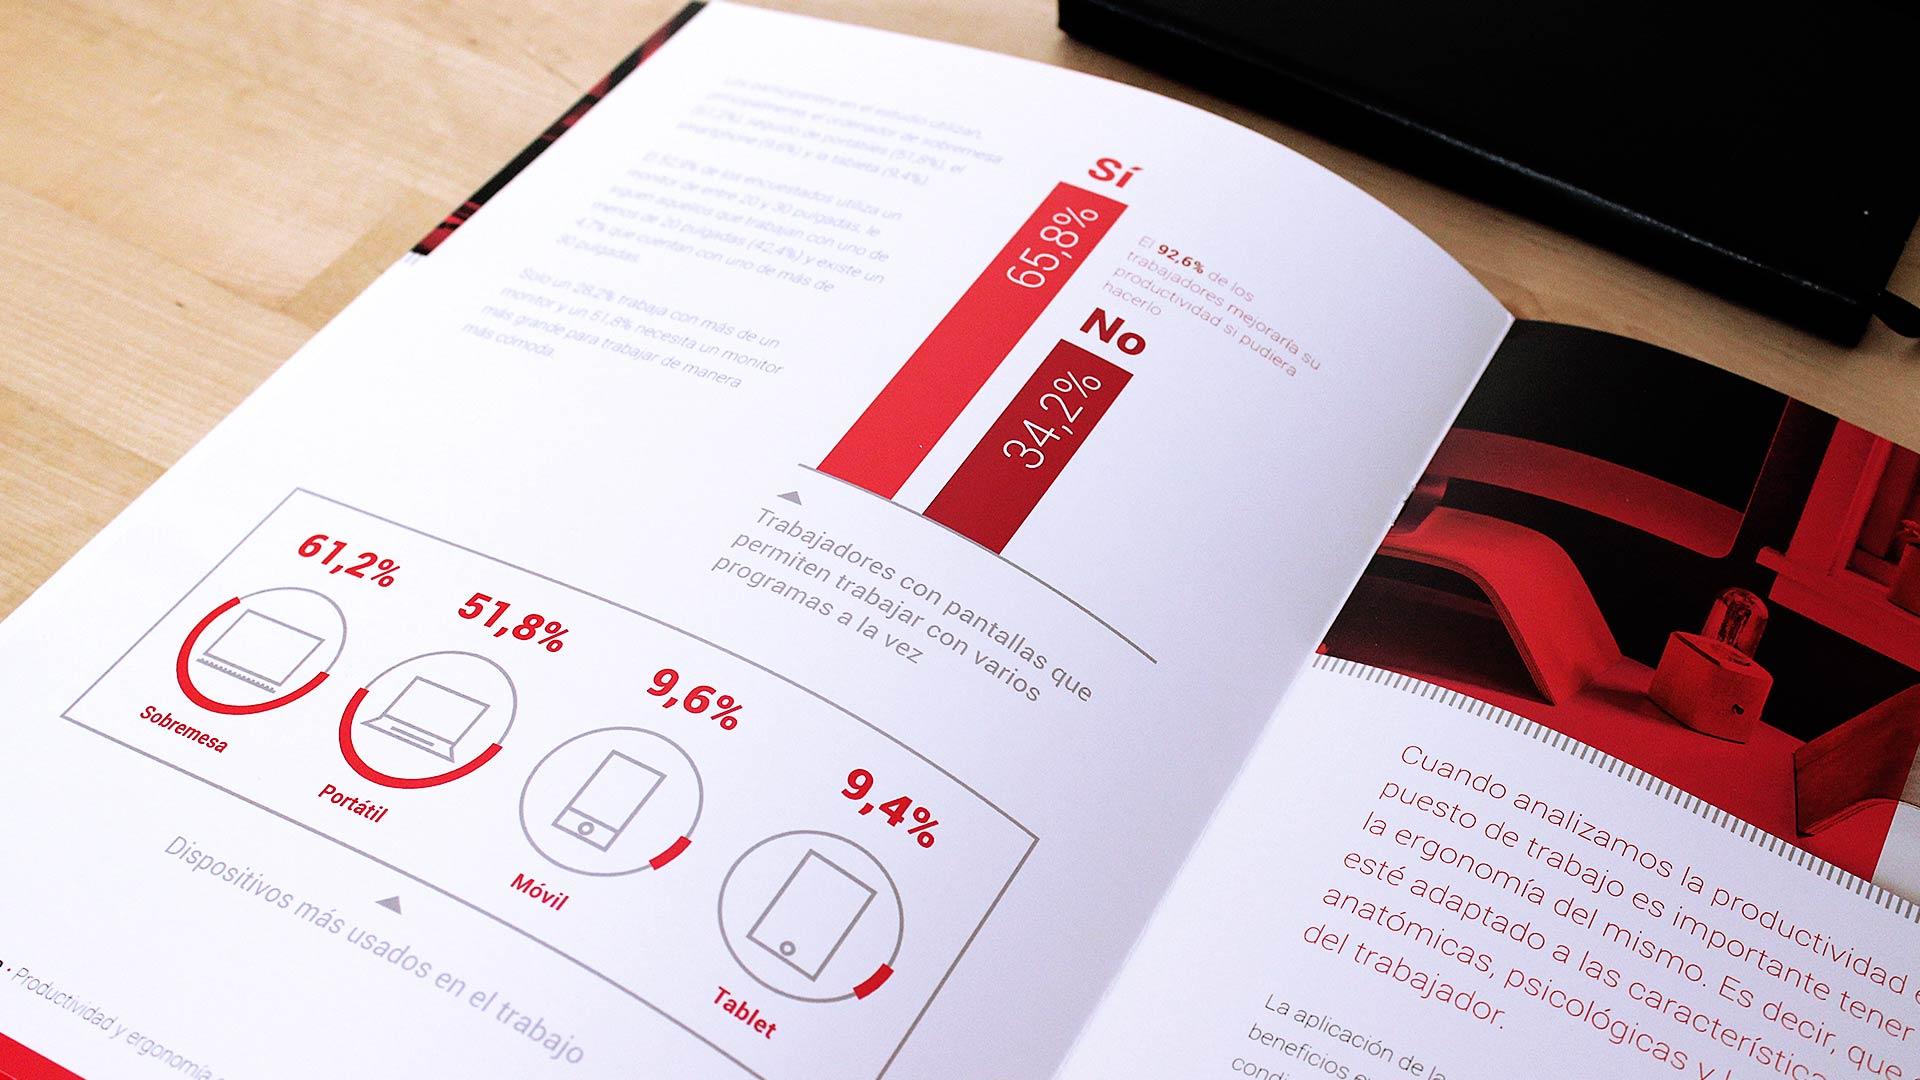 LG--content-marketing-informe-resumen-ejecutivo-ebook-ergonomia--2017_05